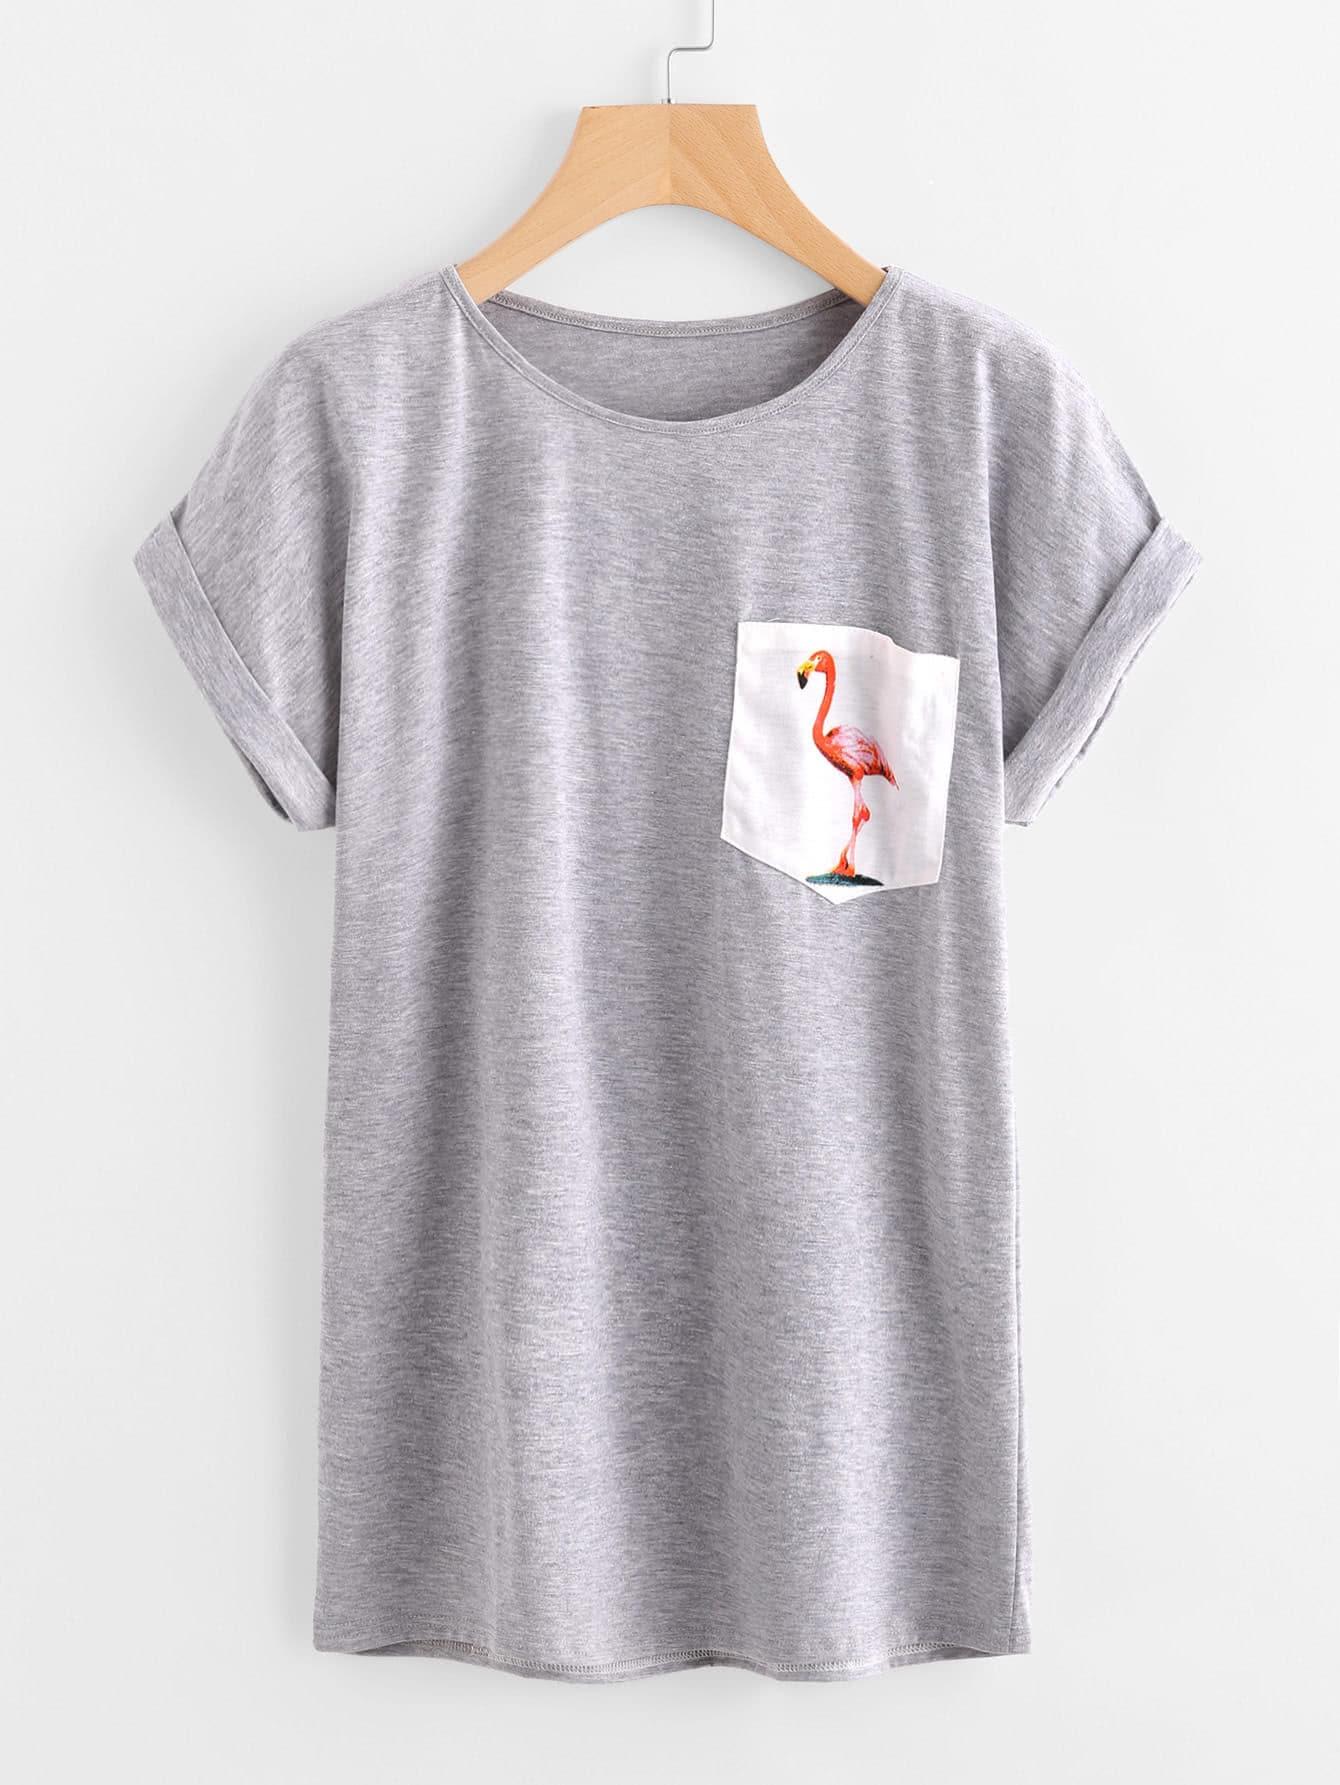 Contrast Flamingo Print Pocket Marled Cuffed Tee graphic print cuffed tee